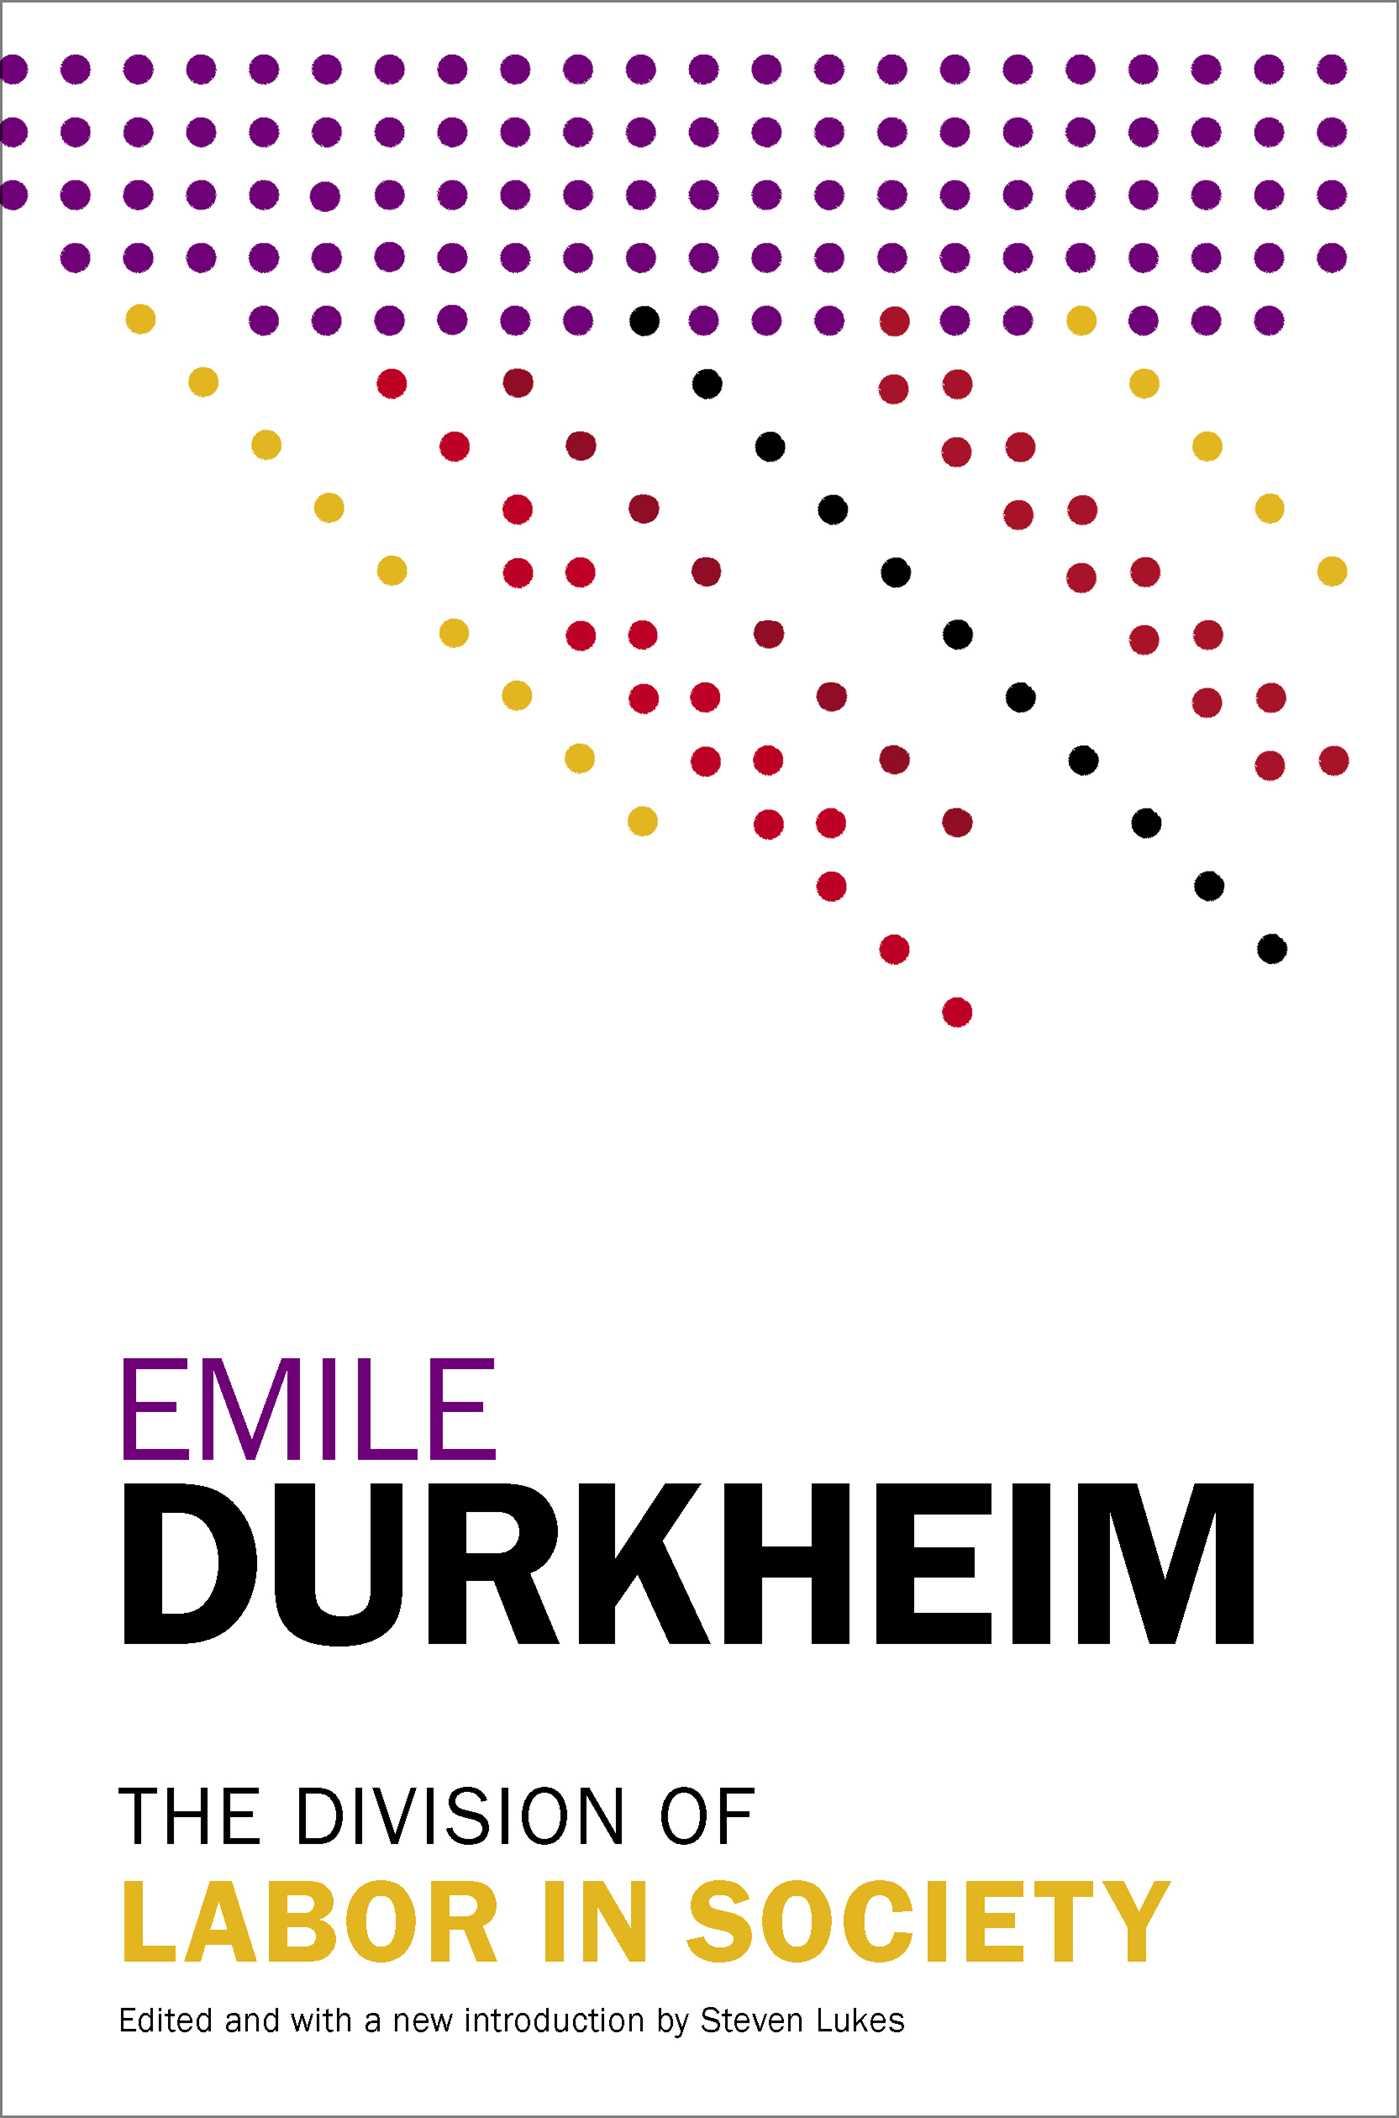 emile durkheim a split of struggle inside society